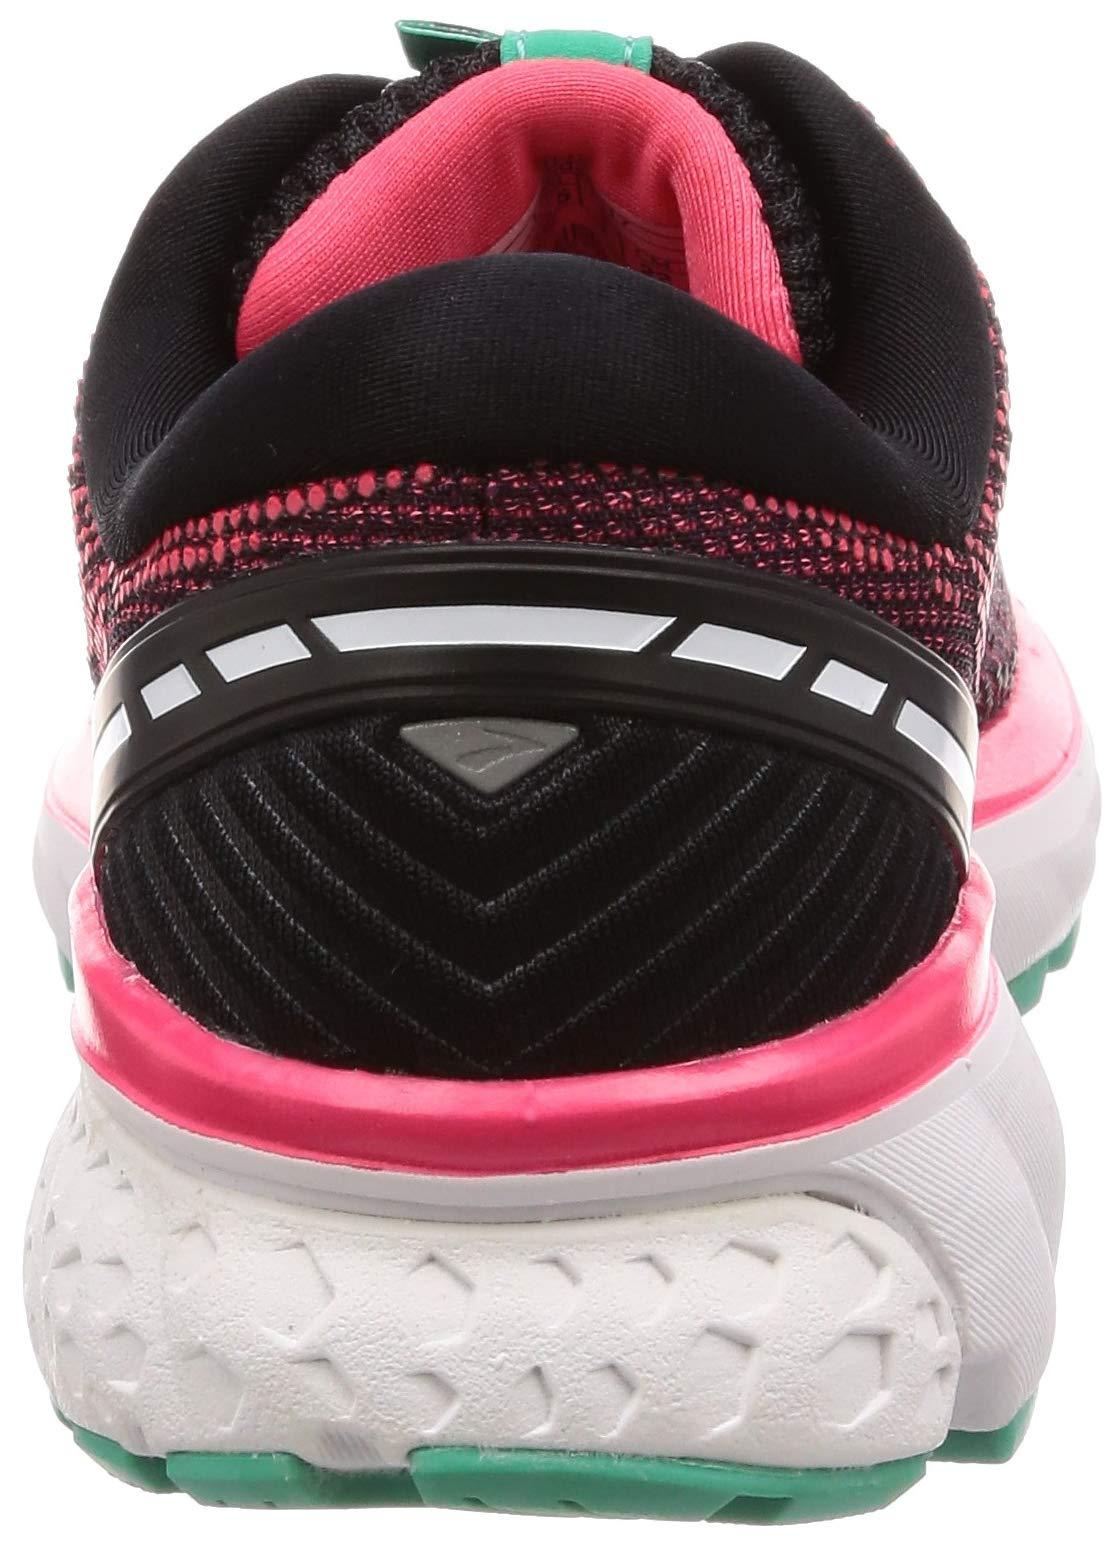 Brooks Womens Ghost 11 Running Shoe - Black/Pink/Aqua - D - 5.0 by Brooks (Image #2)